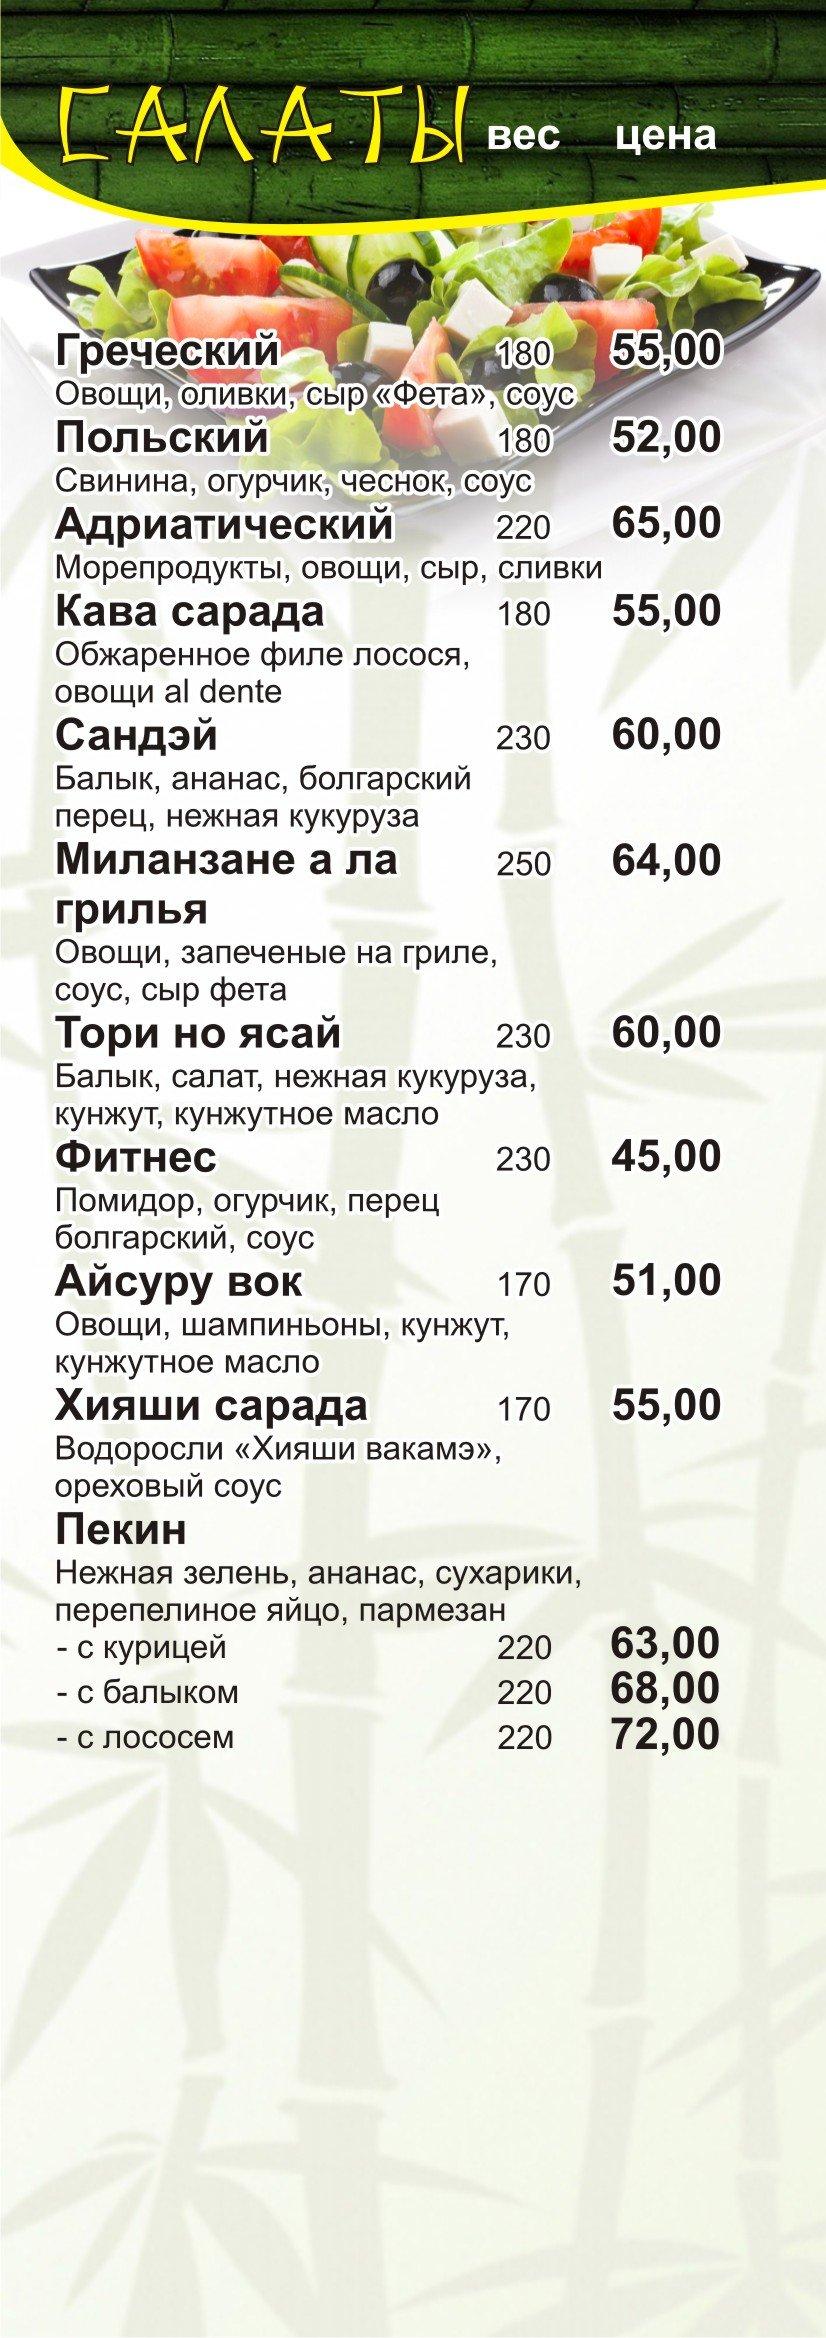 "Суши бесплатно! Праздничное предложение от кафе ""Панда - пицца, роллы"", фото-4"